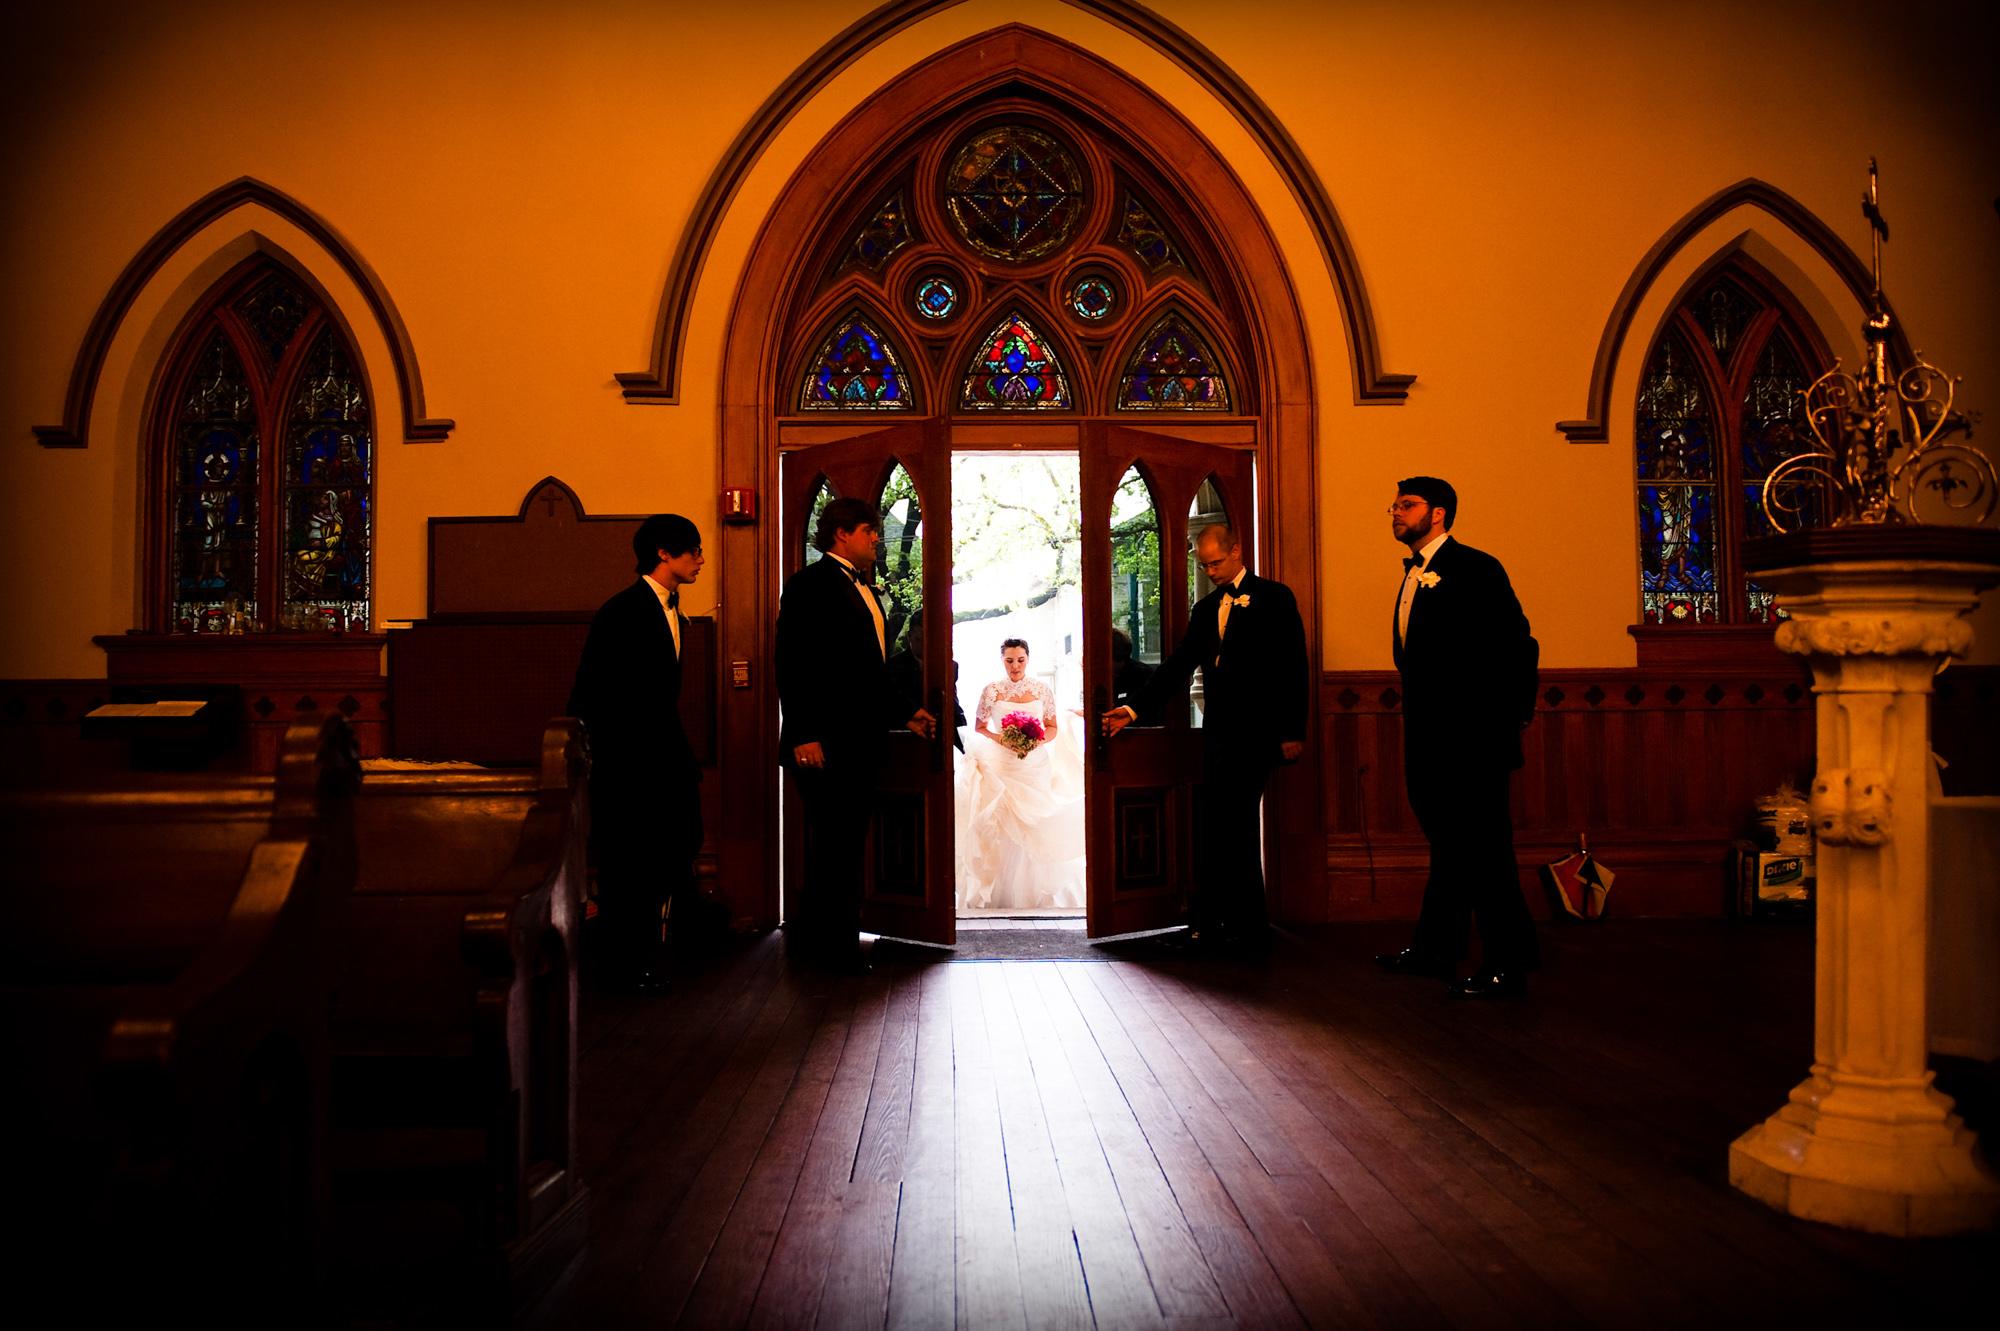 Scott-Myers-Photography-WeddingScott-Myers-Photography-Wedding_SAM7272.jpg